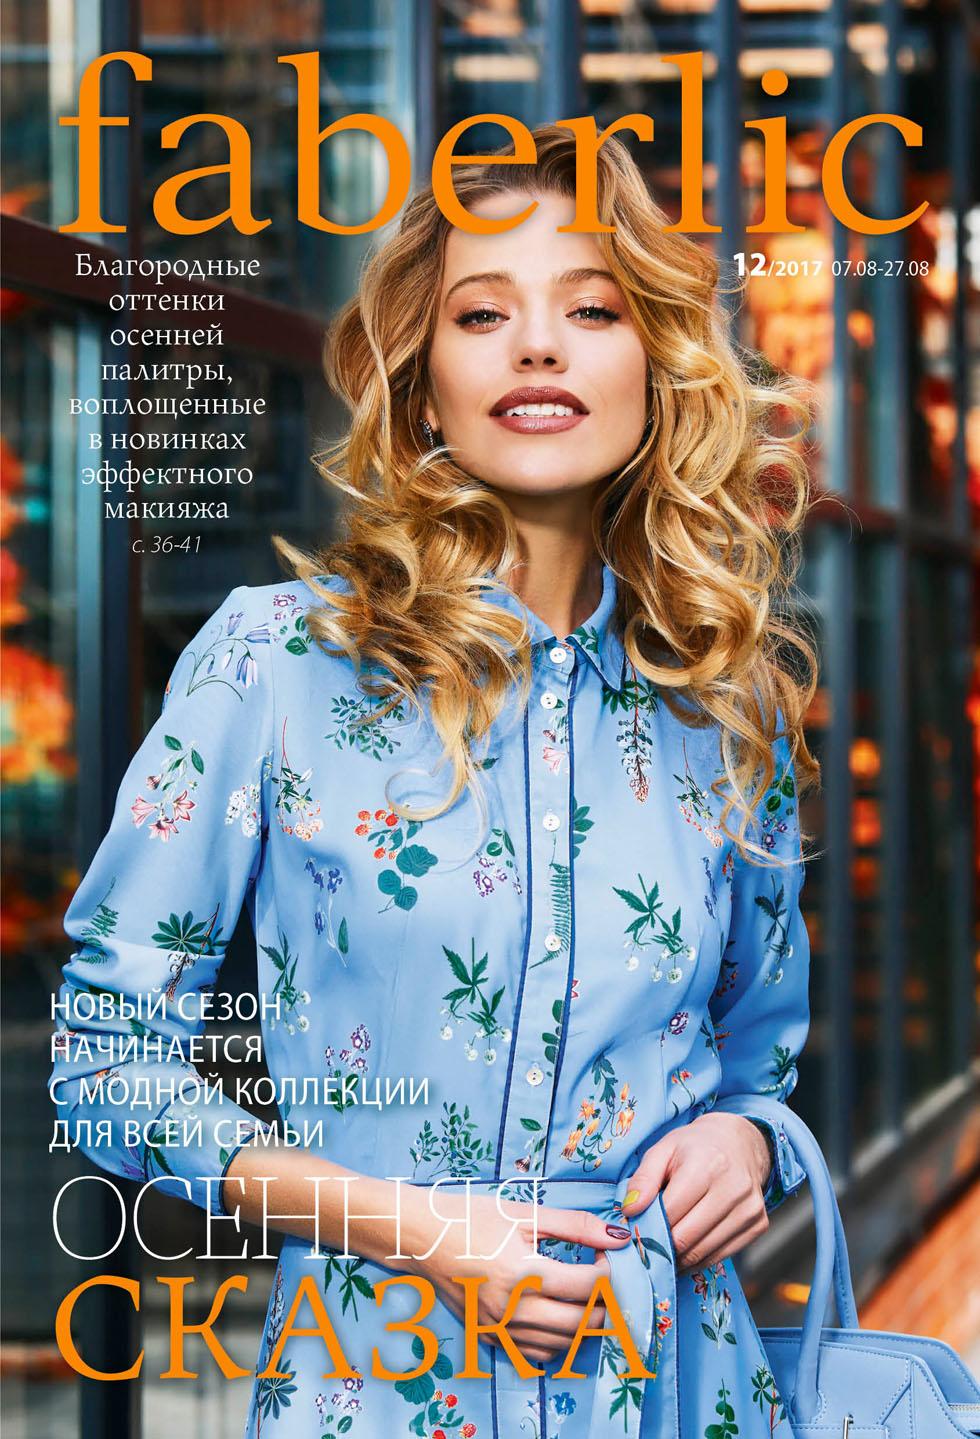 Каталог Faberlic осень 2017